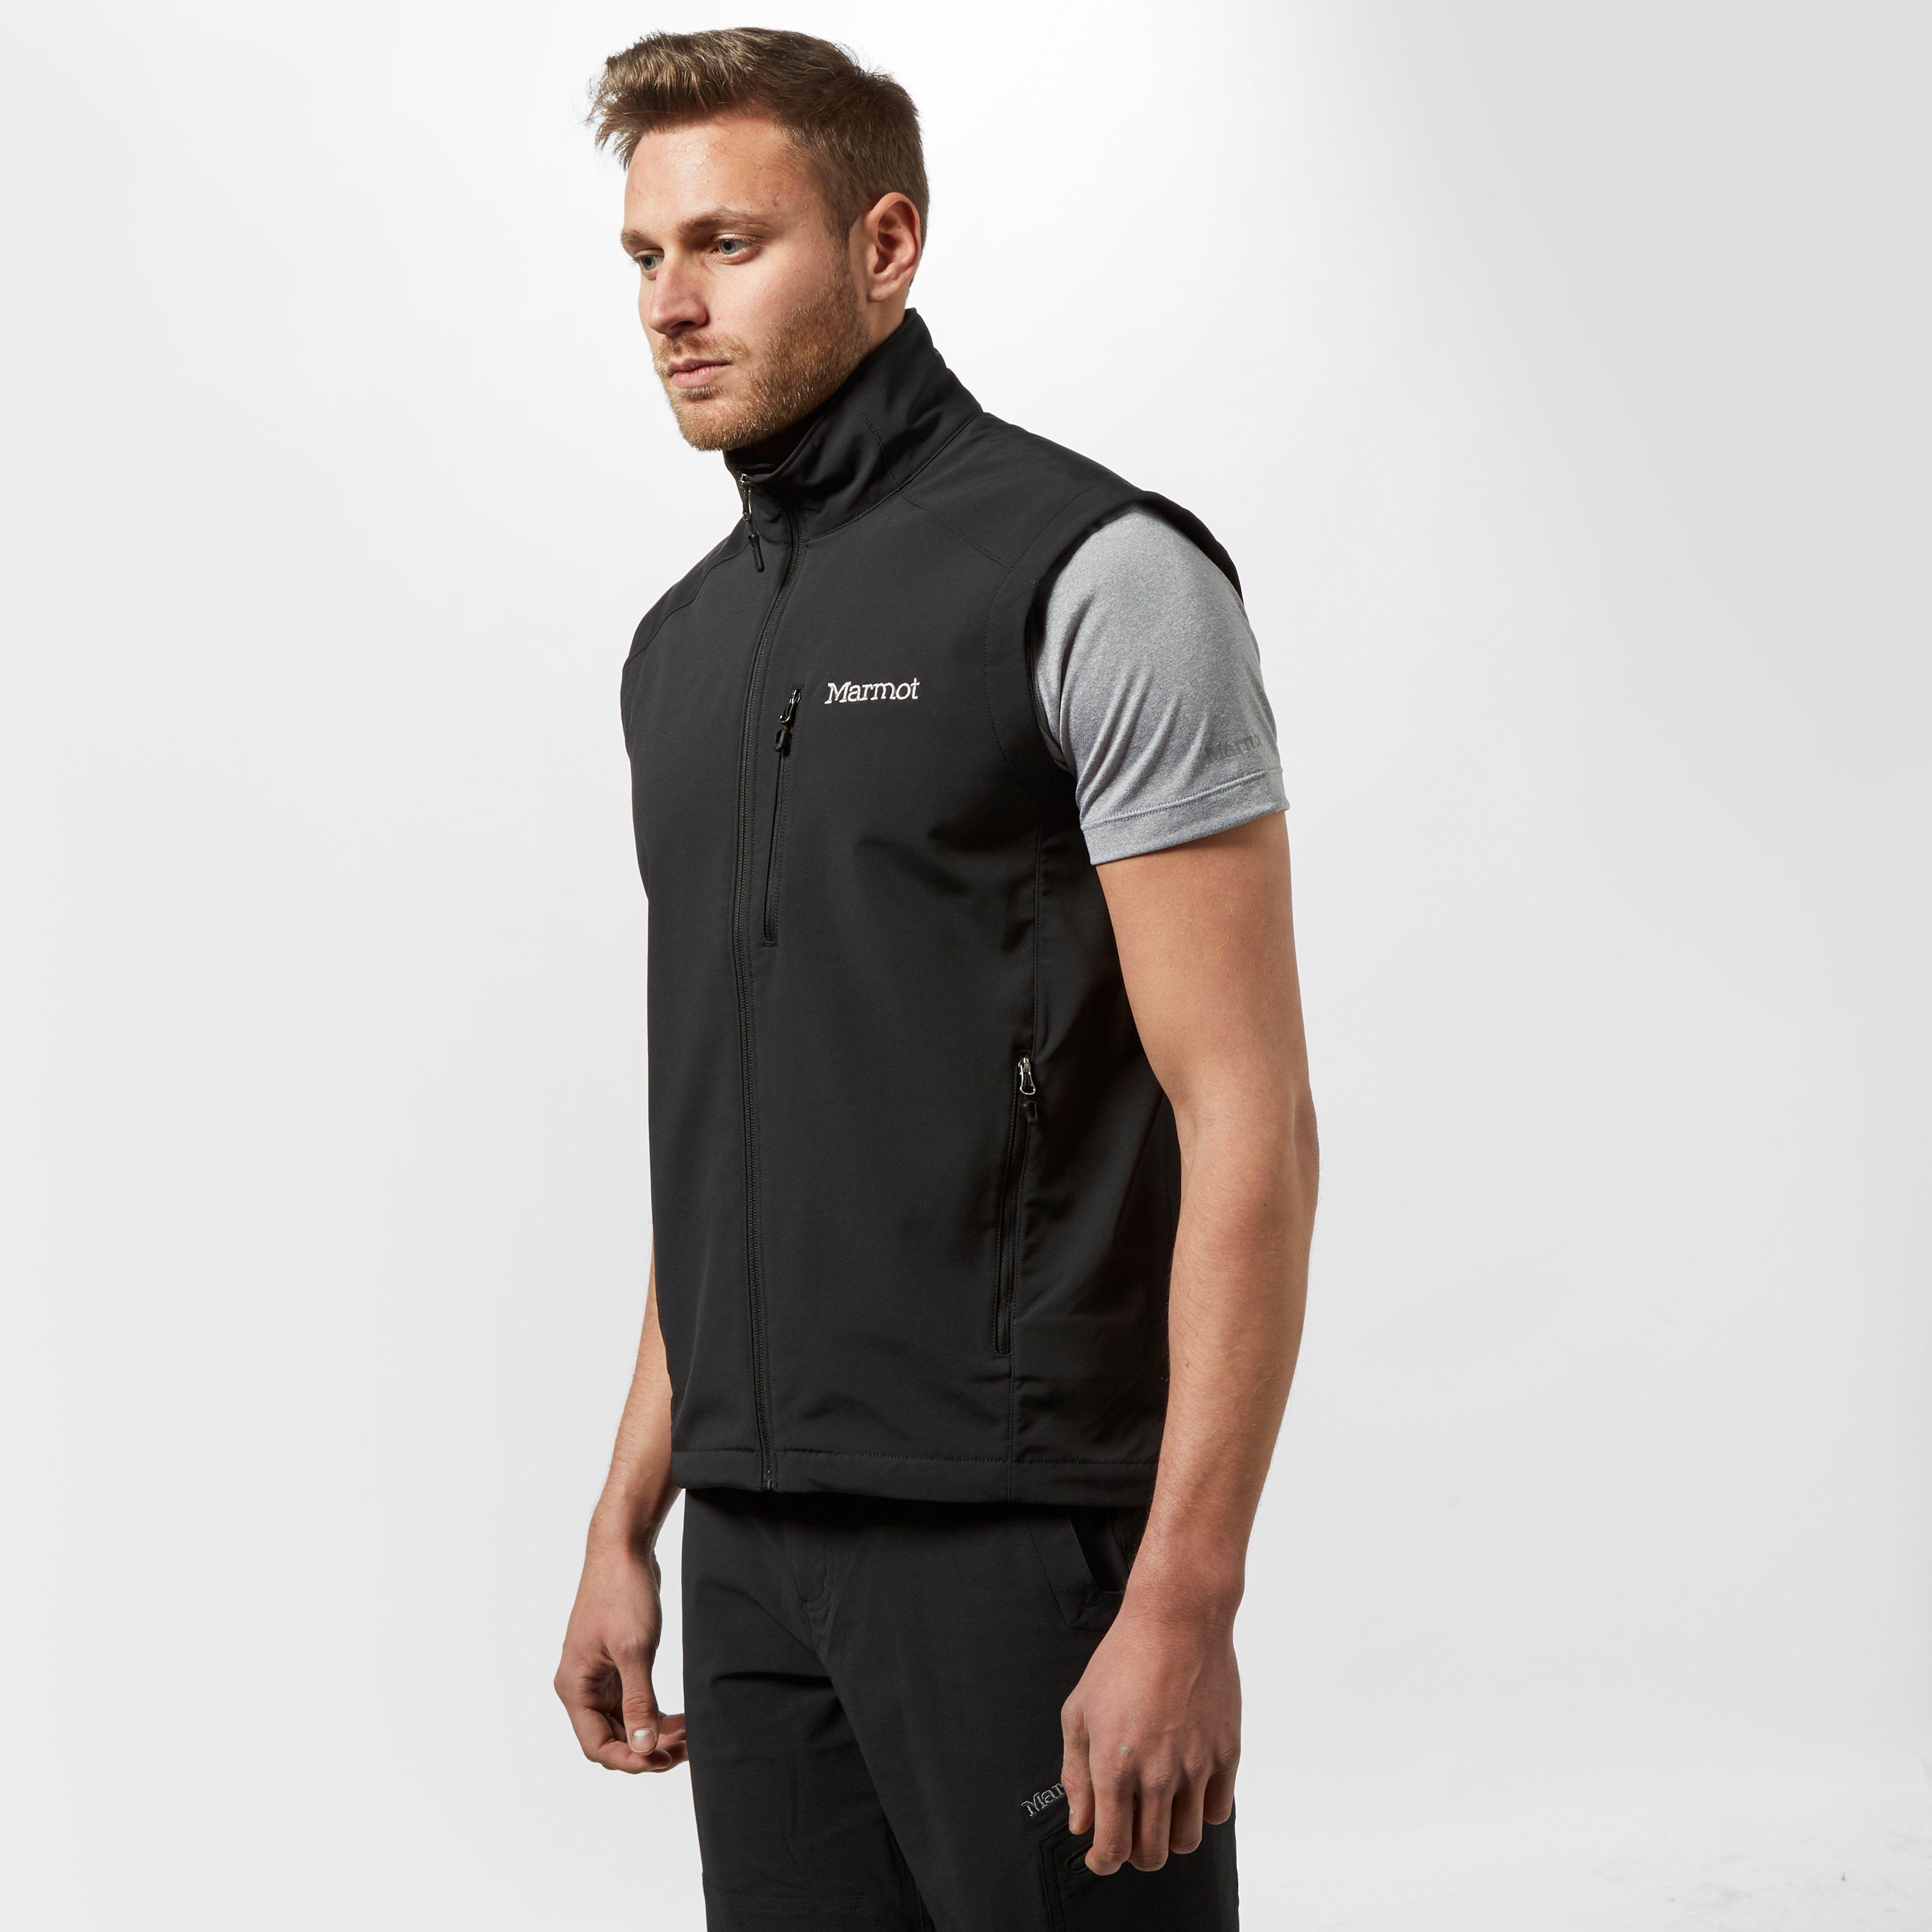 MARMOT Men's Approach Softshell Jacket